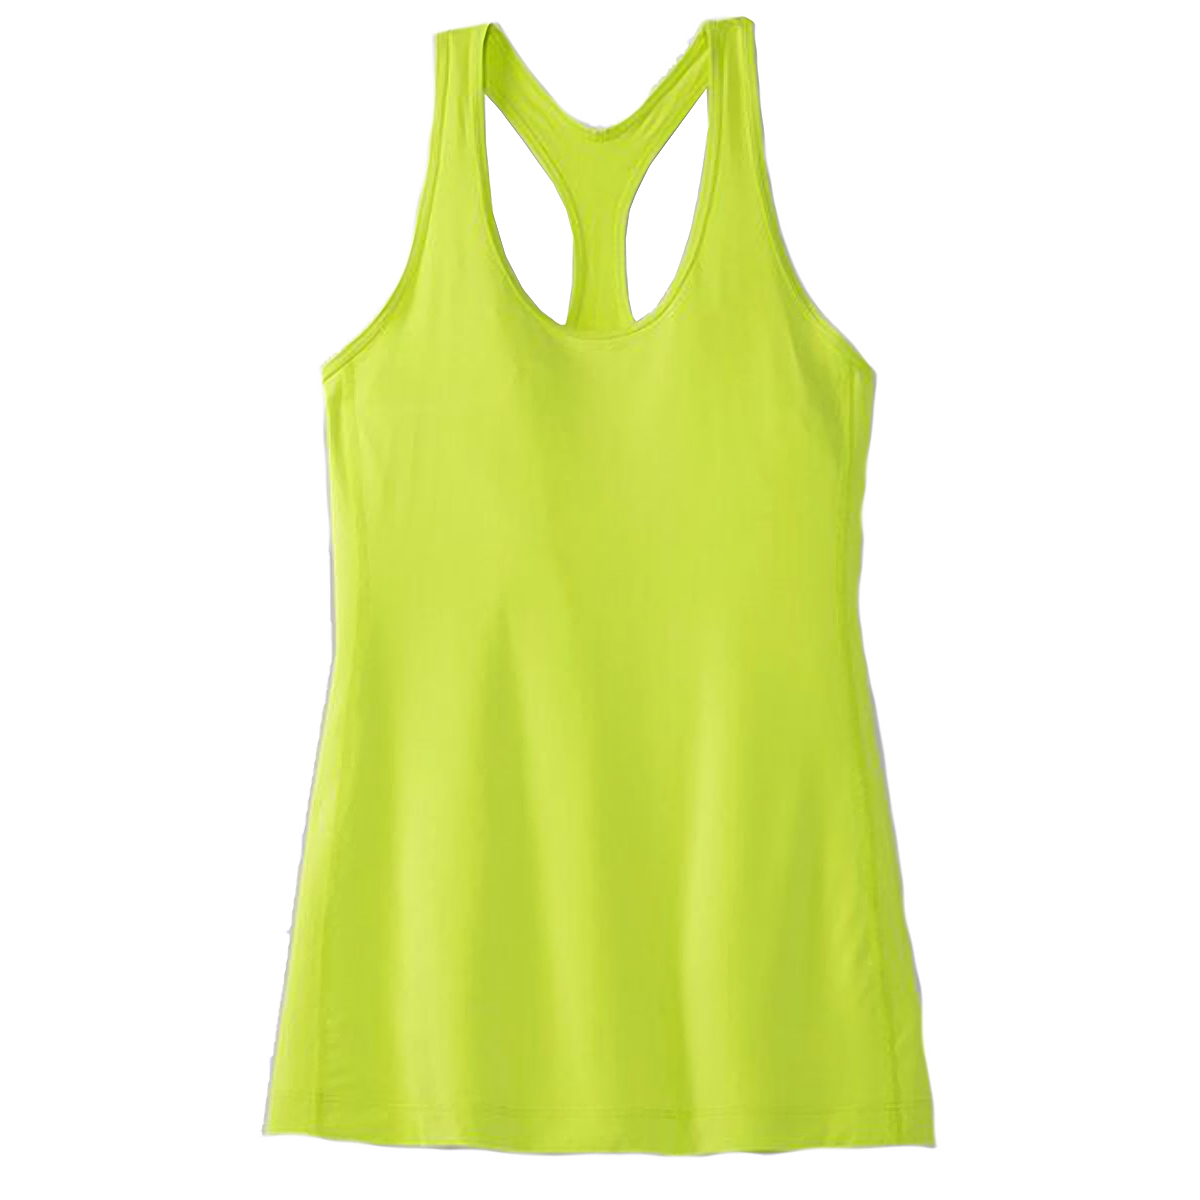 Women's Brooks Pick-Up Tank  - Color: Lime - Size: XS, Lime, large, image 4